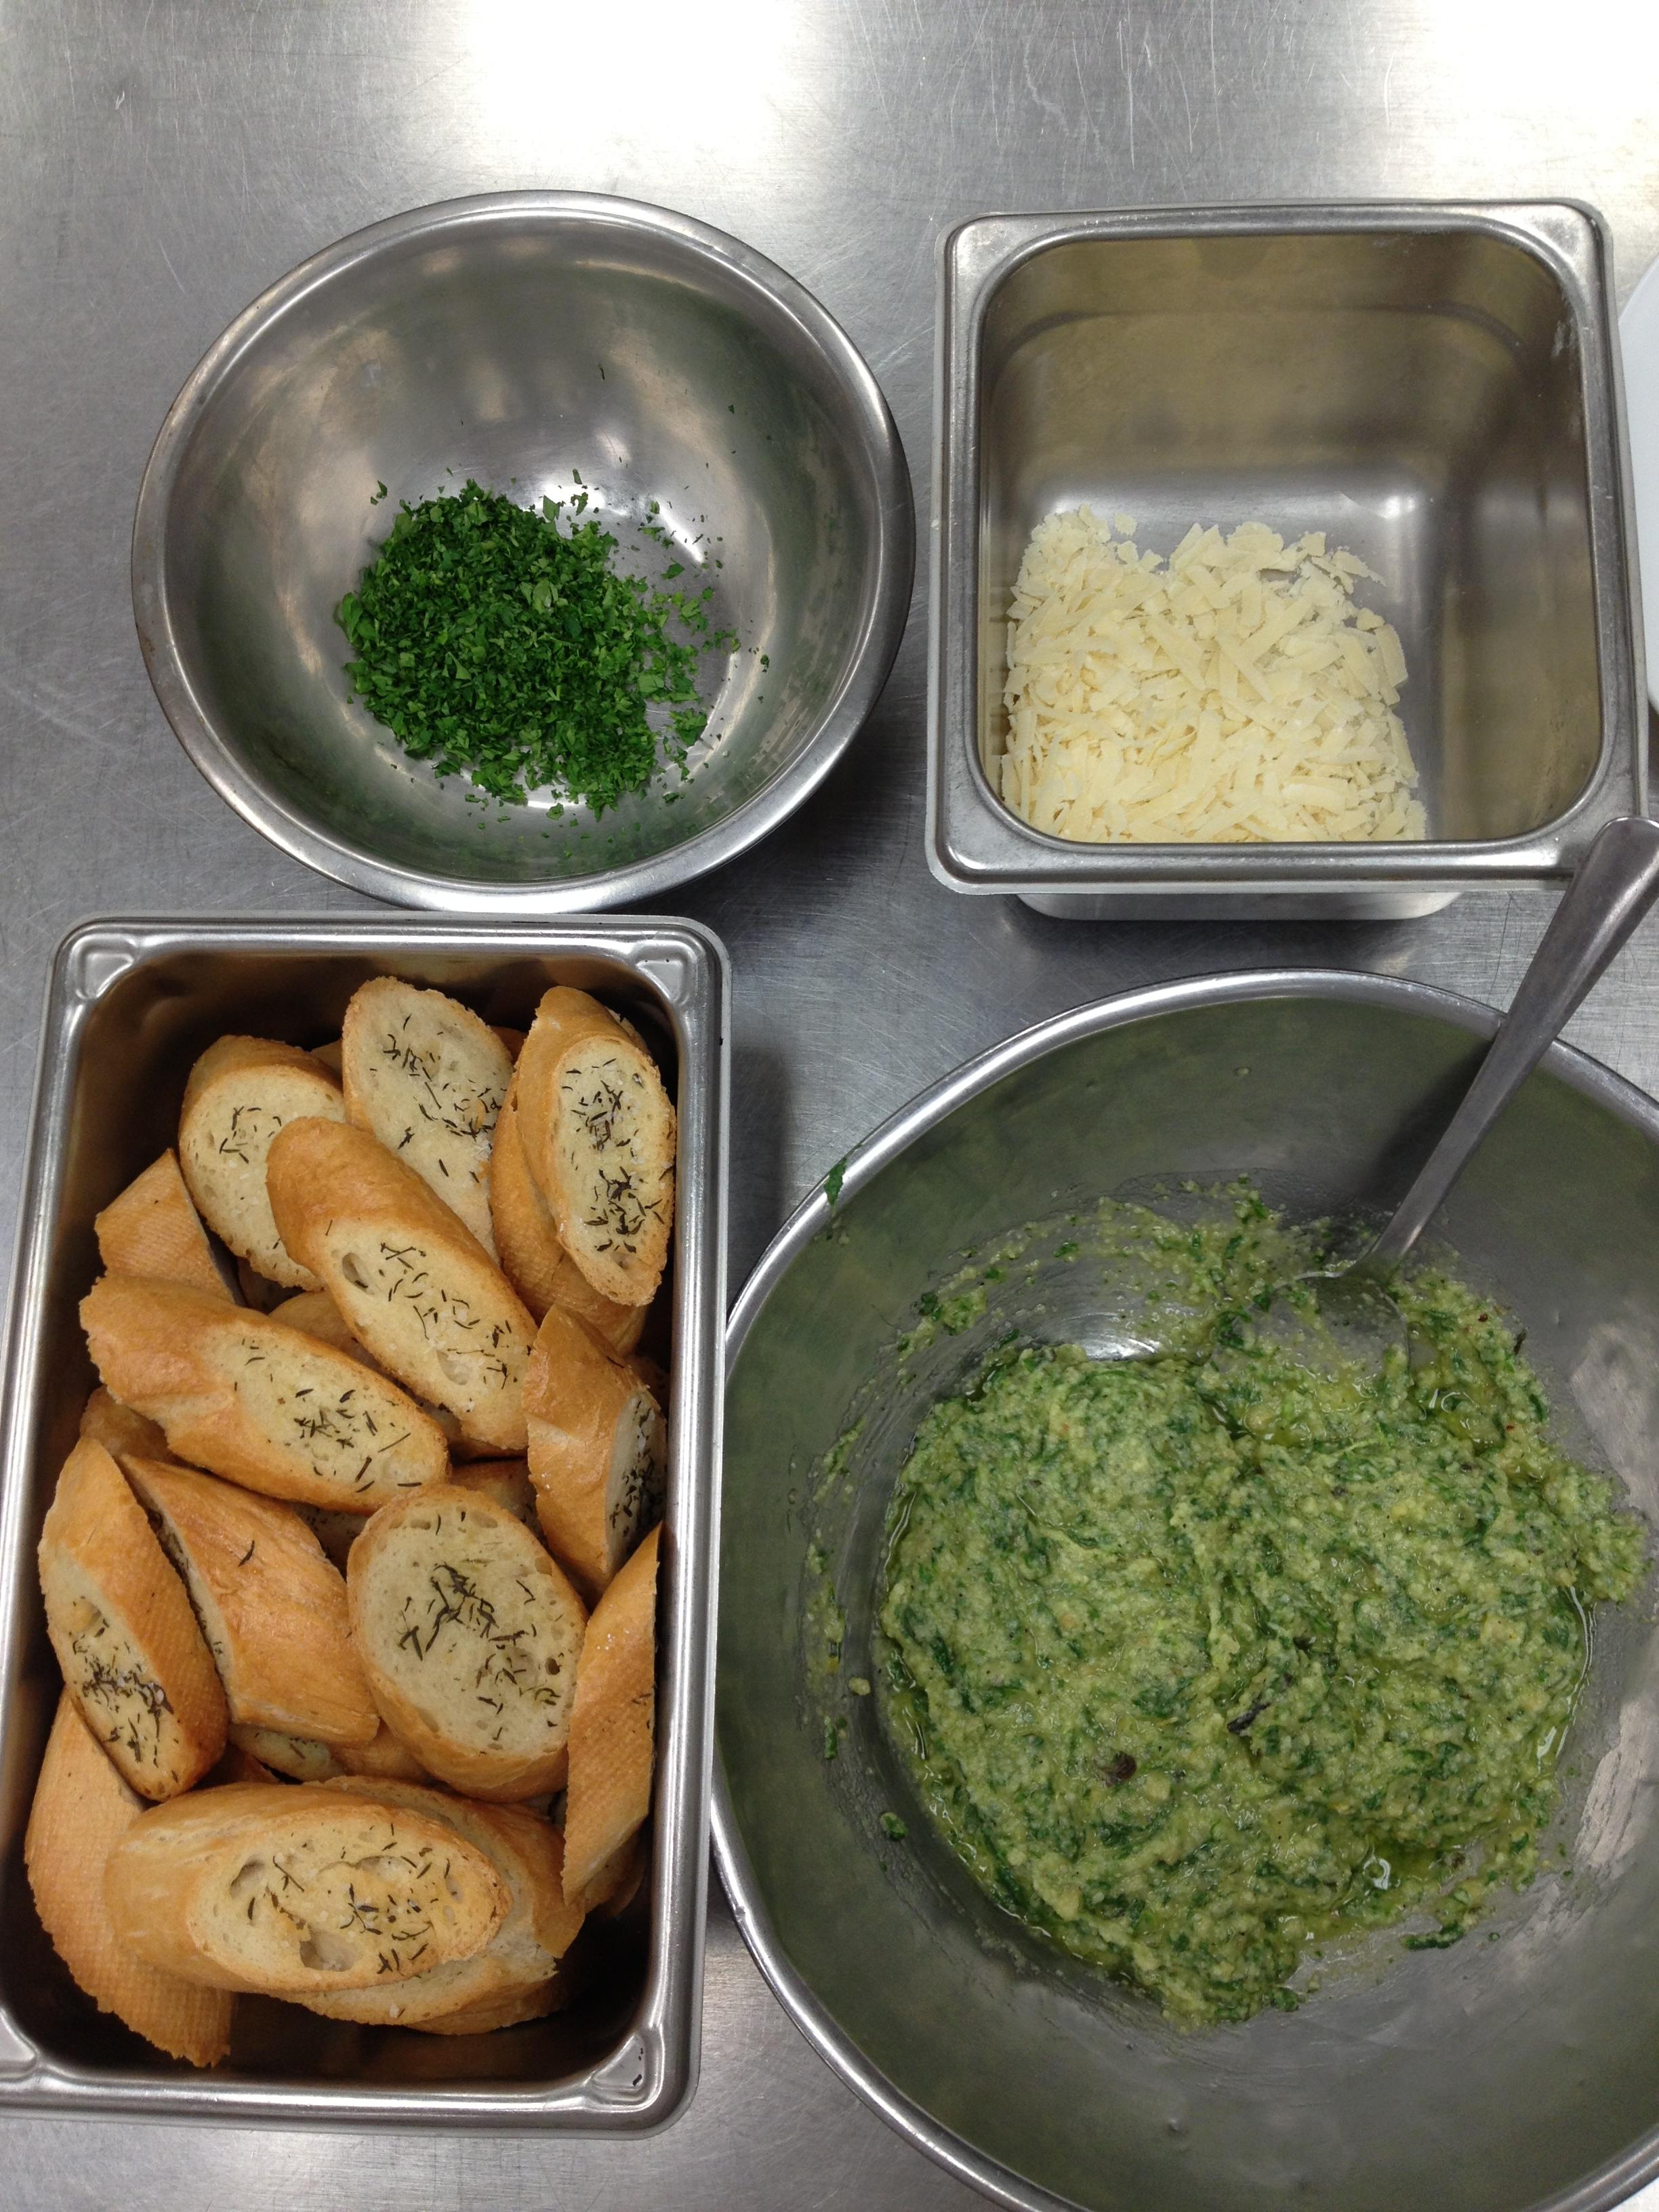 Pesto, Parmesan, Parsley, and Bread